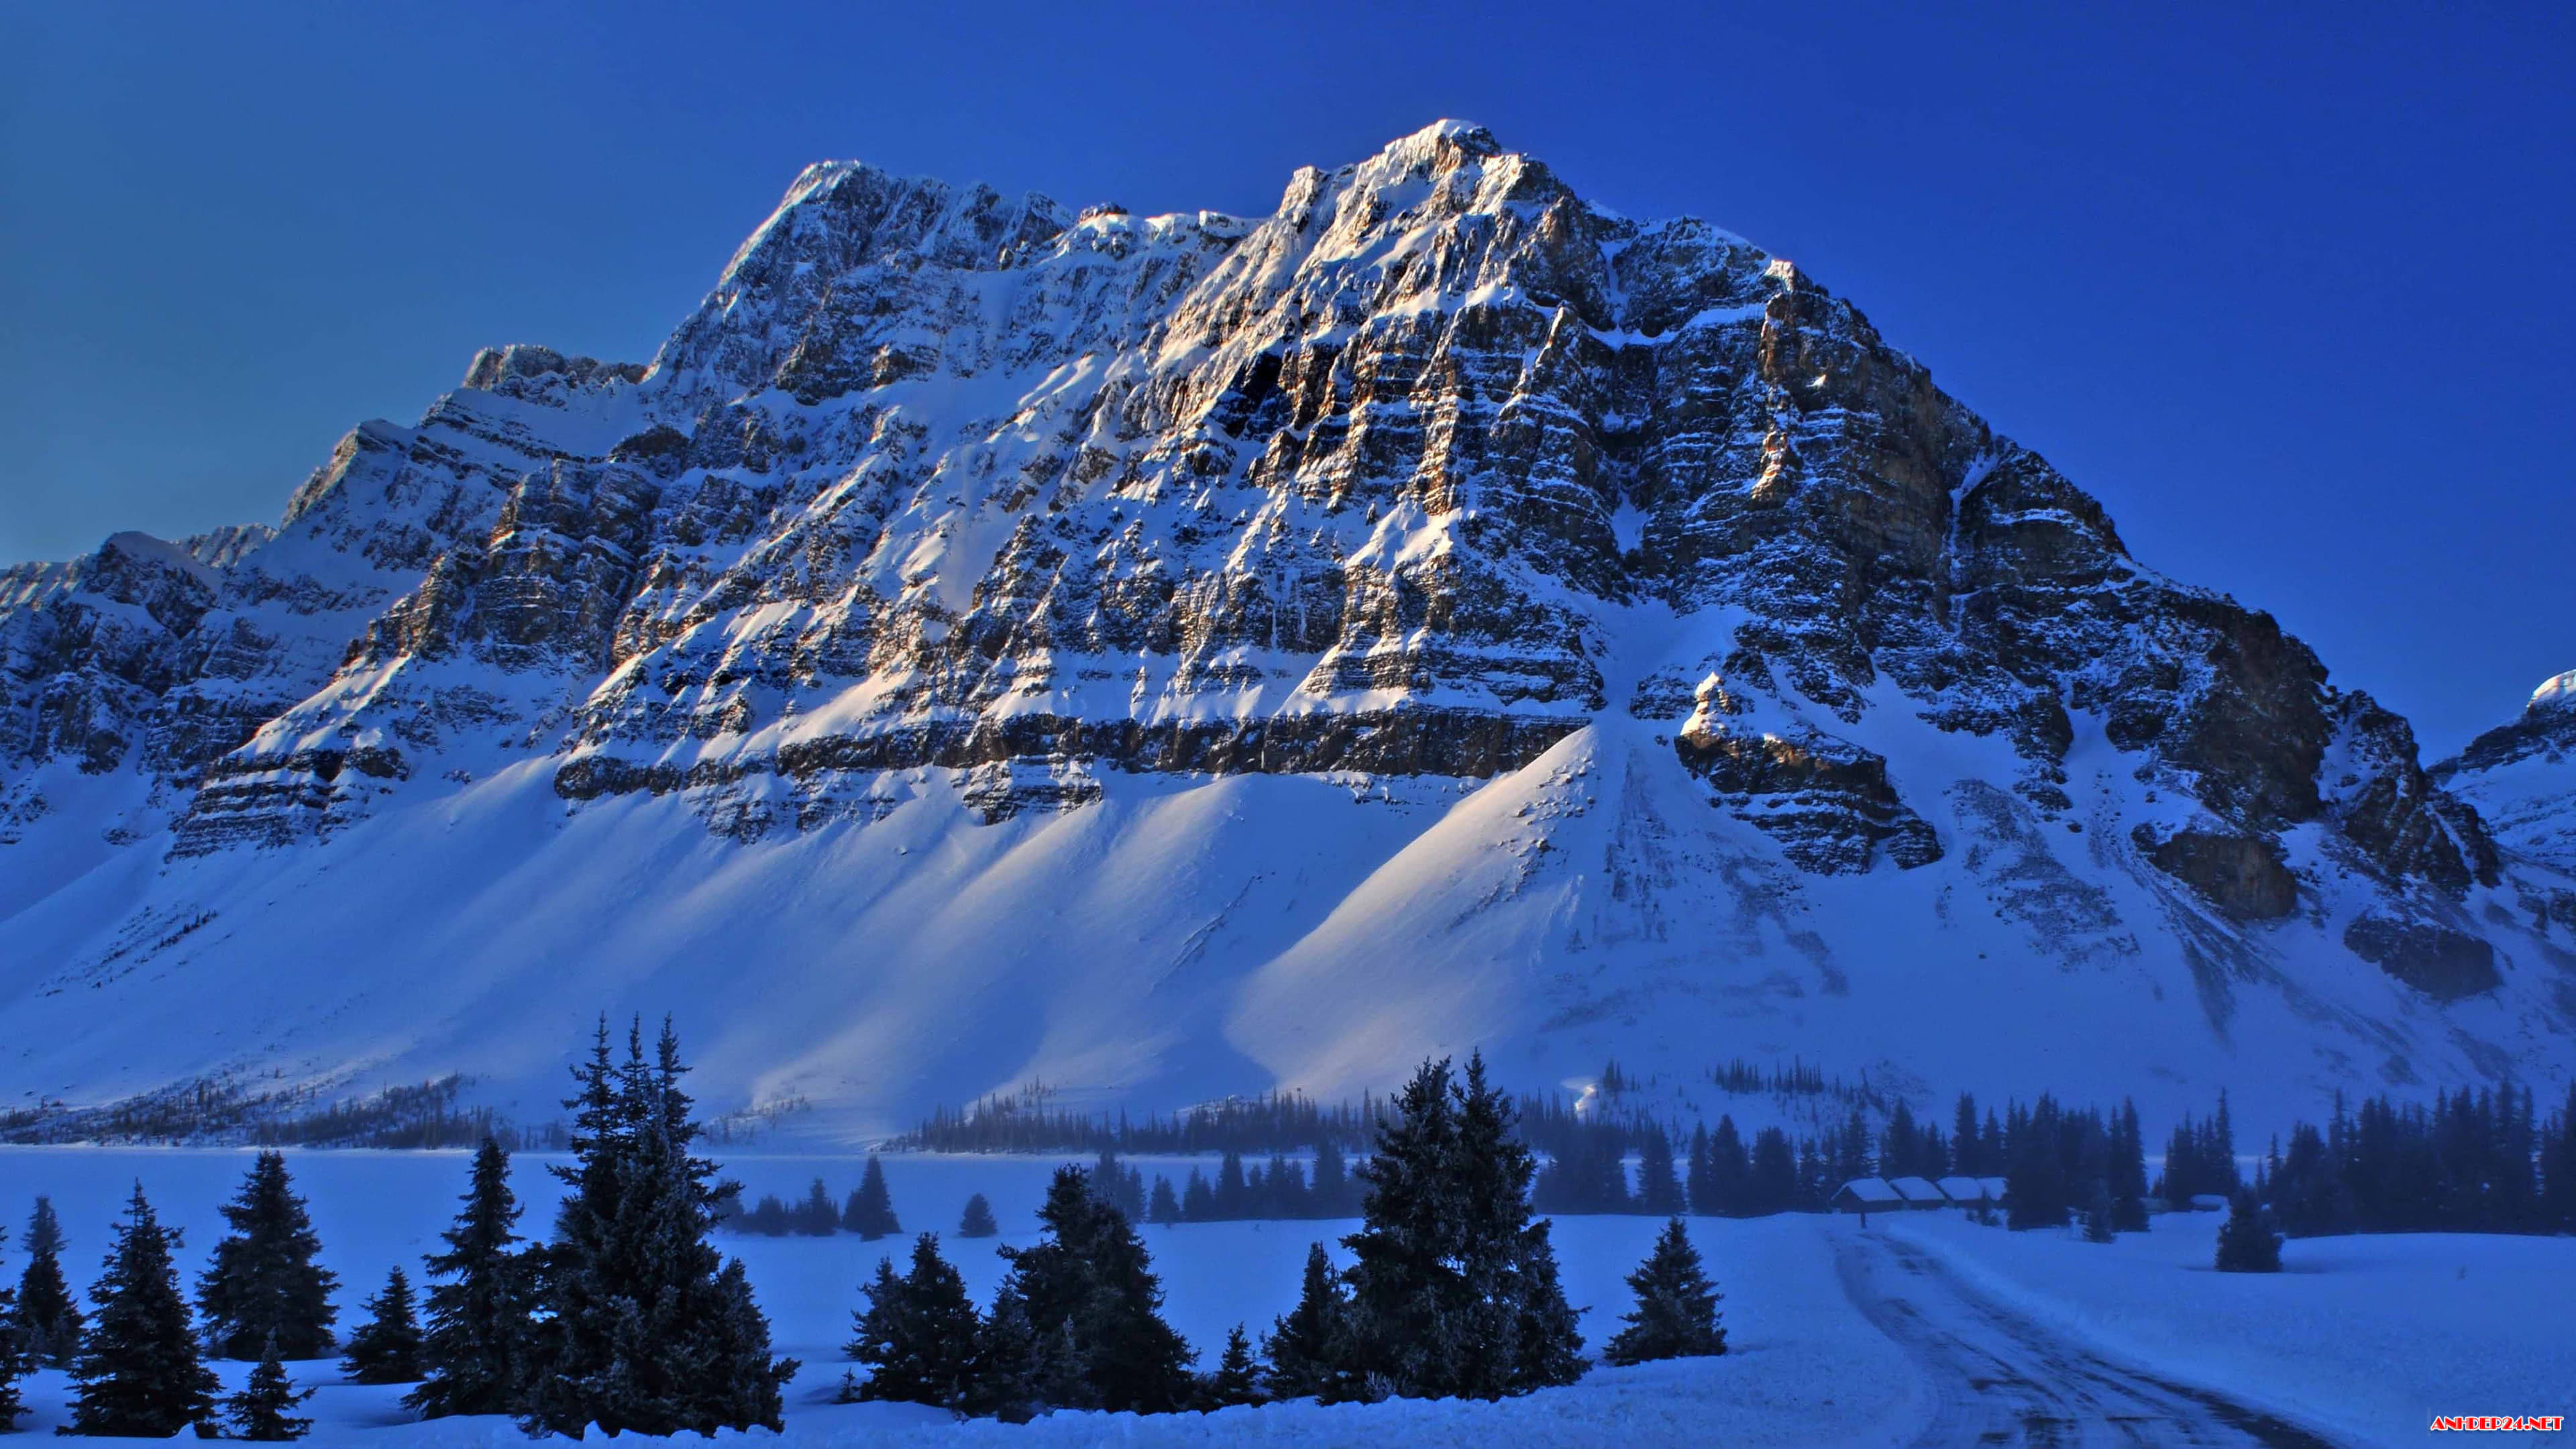 snowy mountains bow lake banff national park alberta canada 4k wallpaper